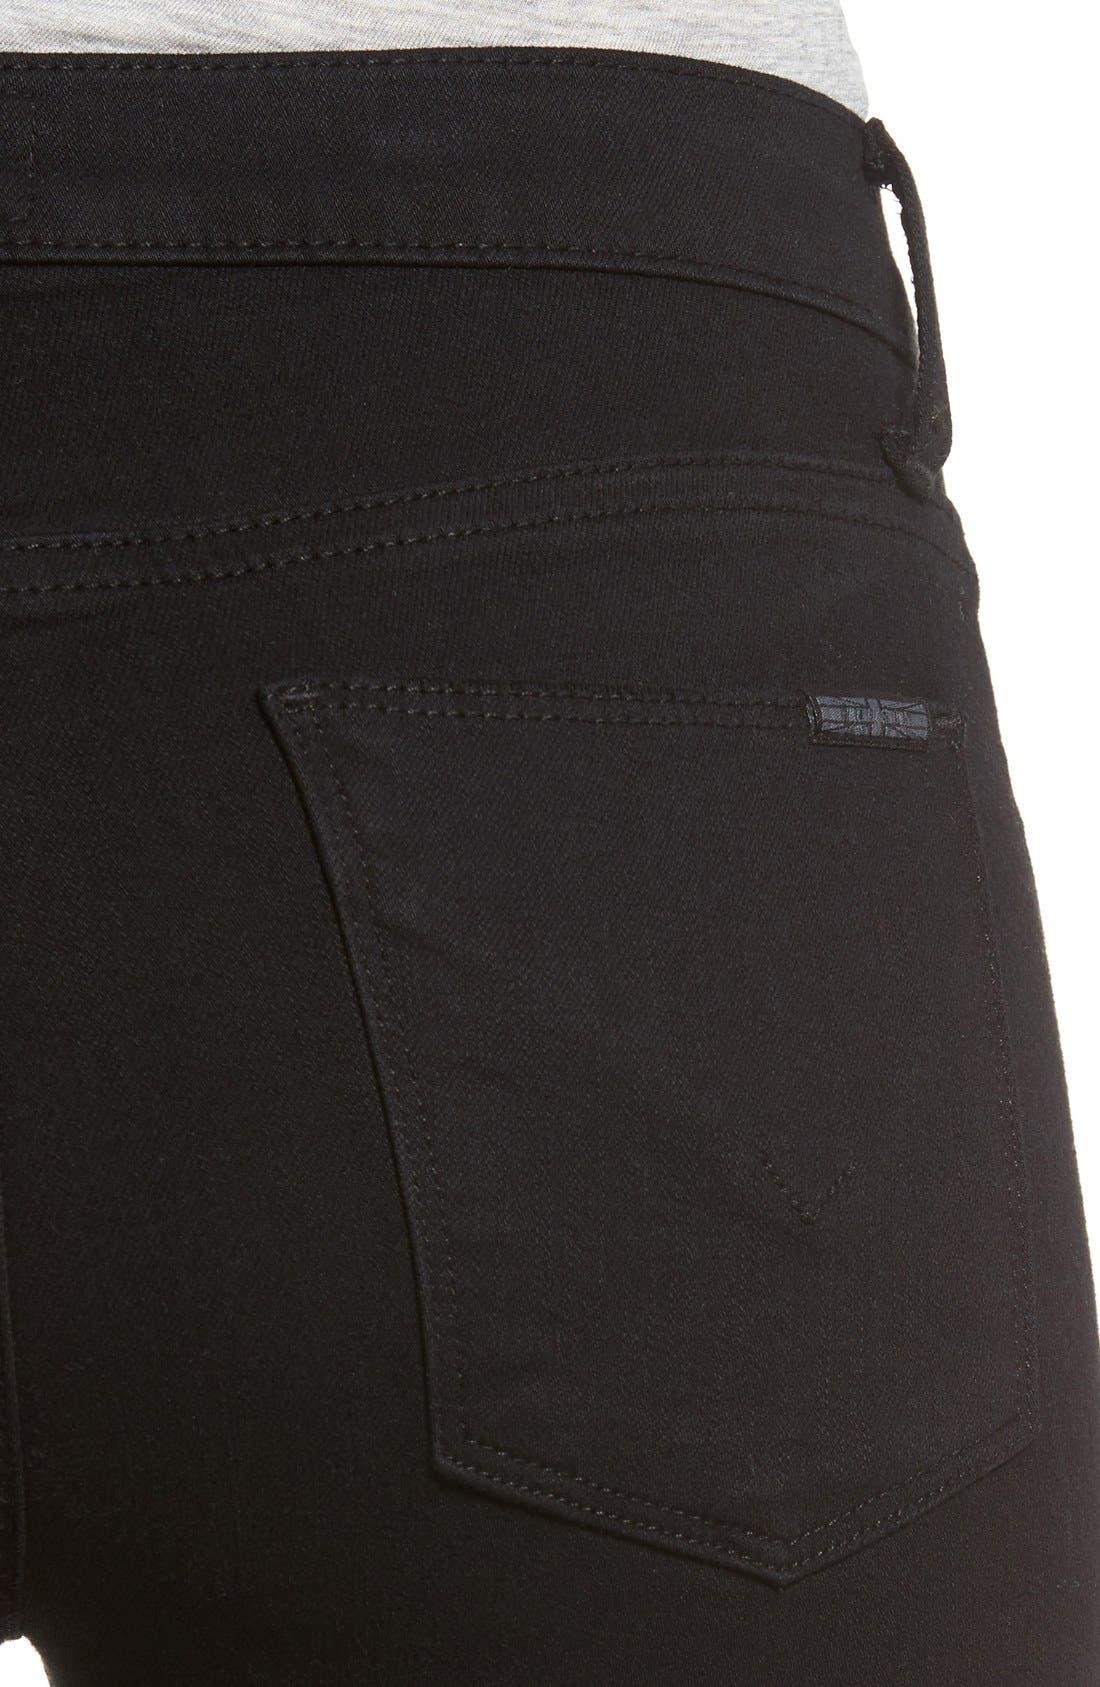 Alternate Image 5  - Hudson Jeans 'Nico' Skinny Jeans (Ravage)